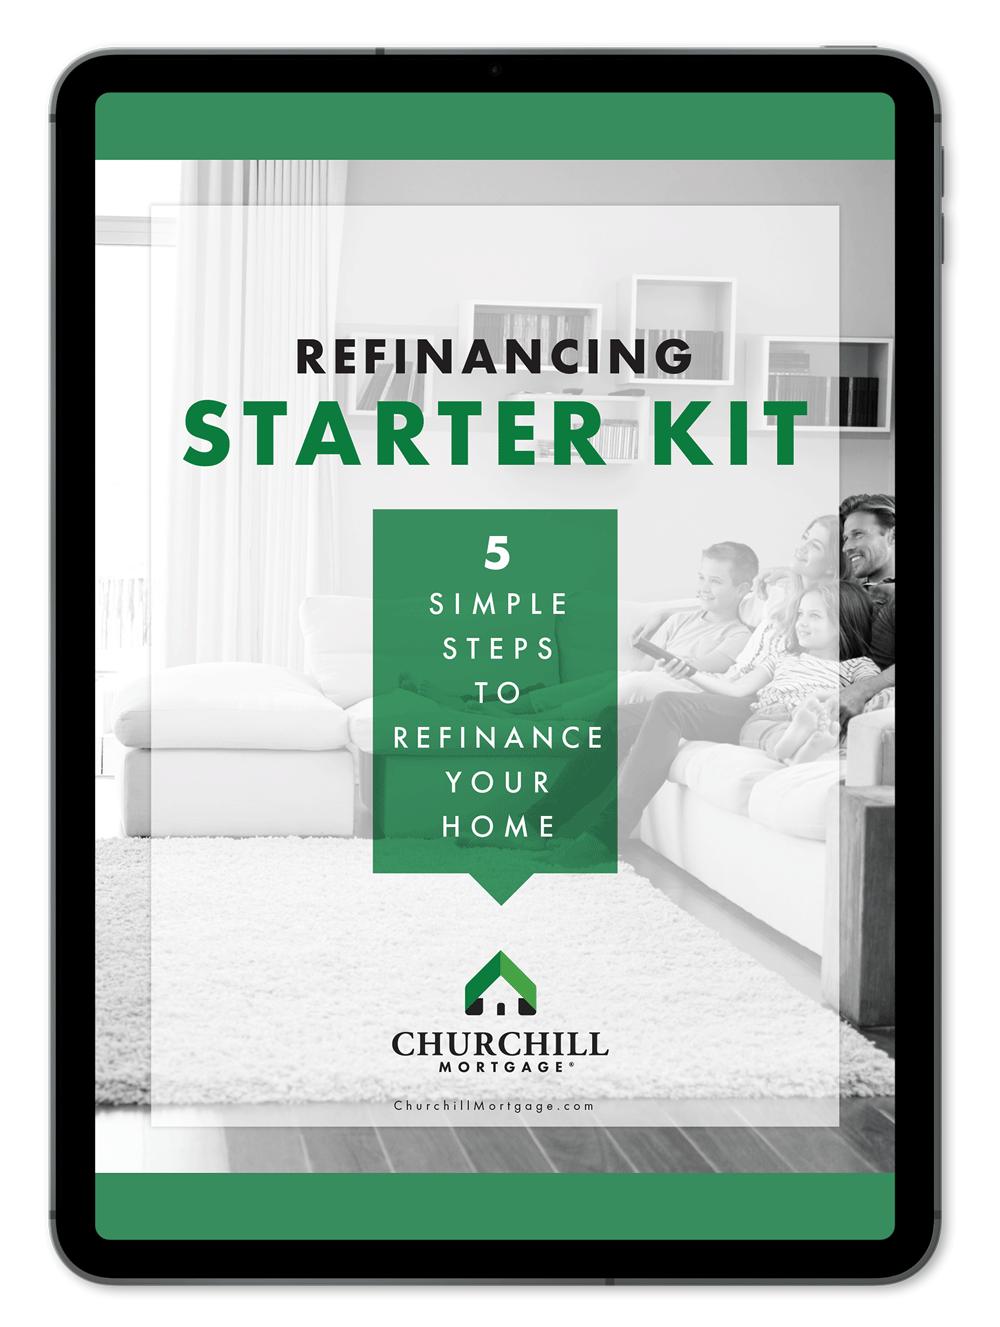 refi-starter-kit-ipad-mockup